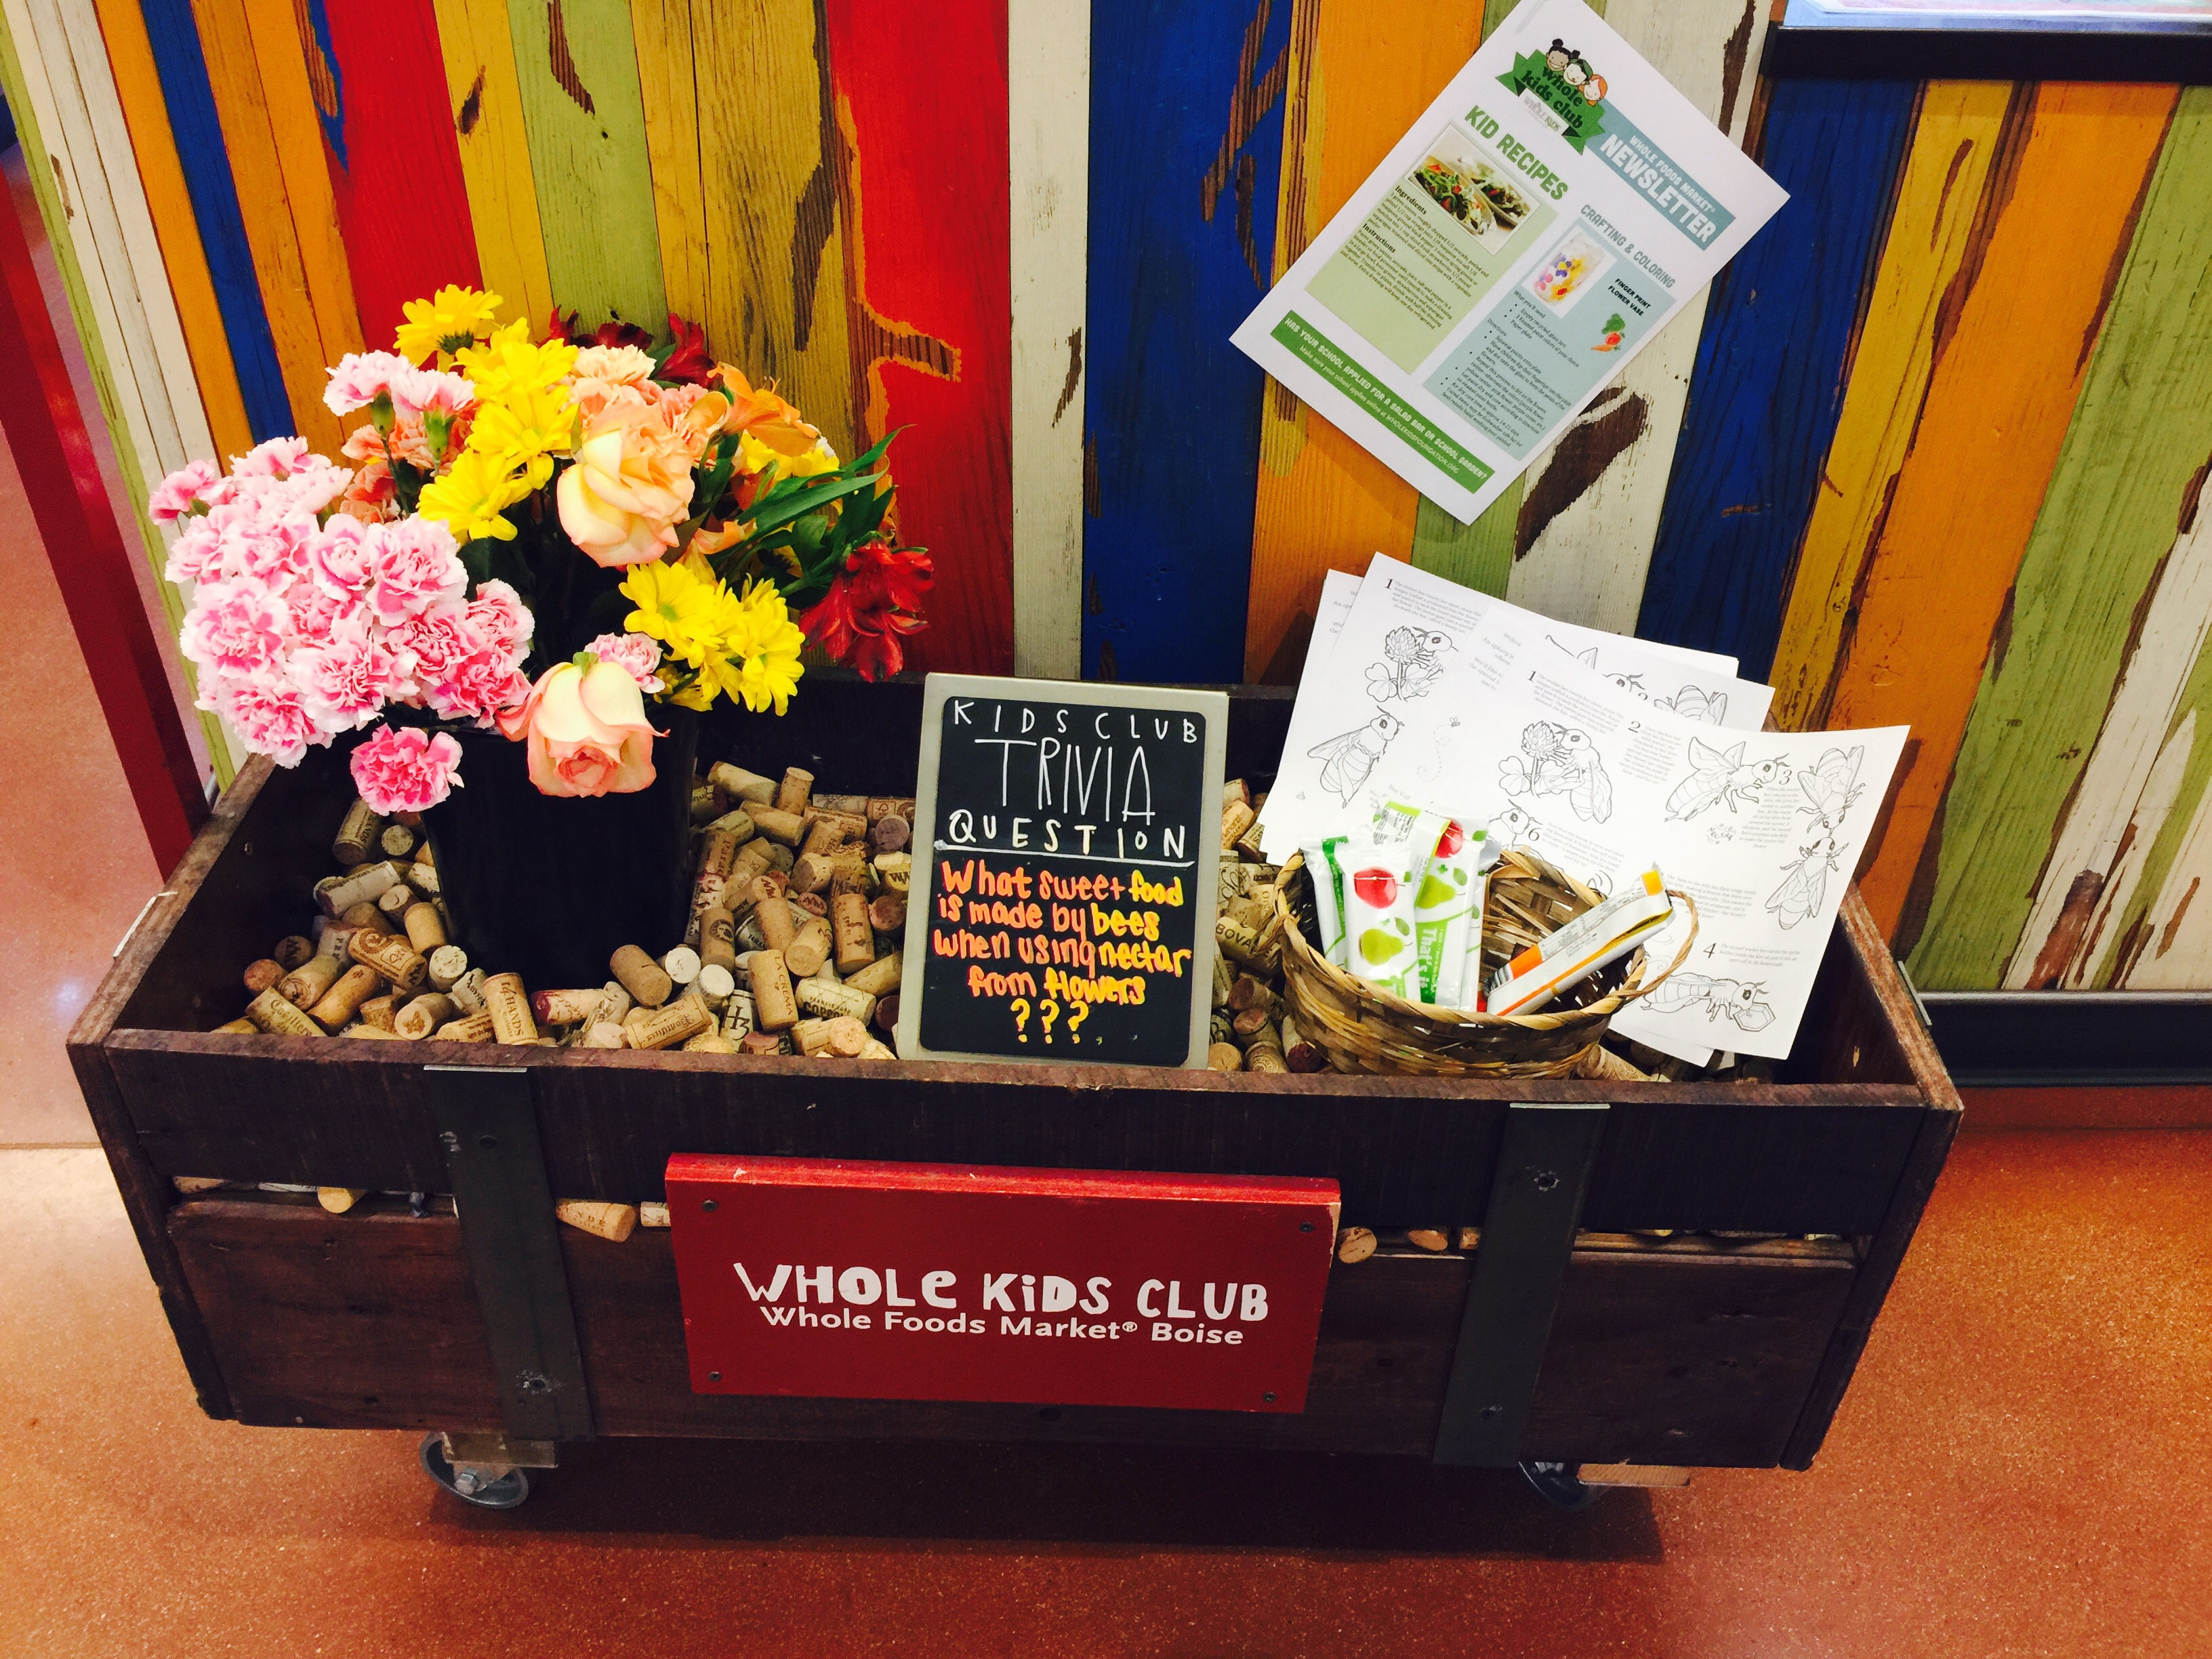 money-saving hacks at Whole Foods Market – kids' club in store display